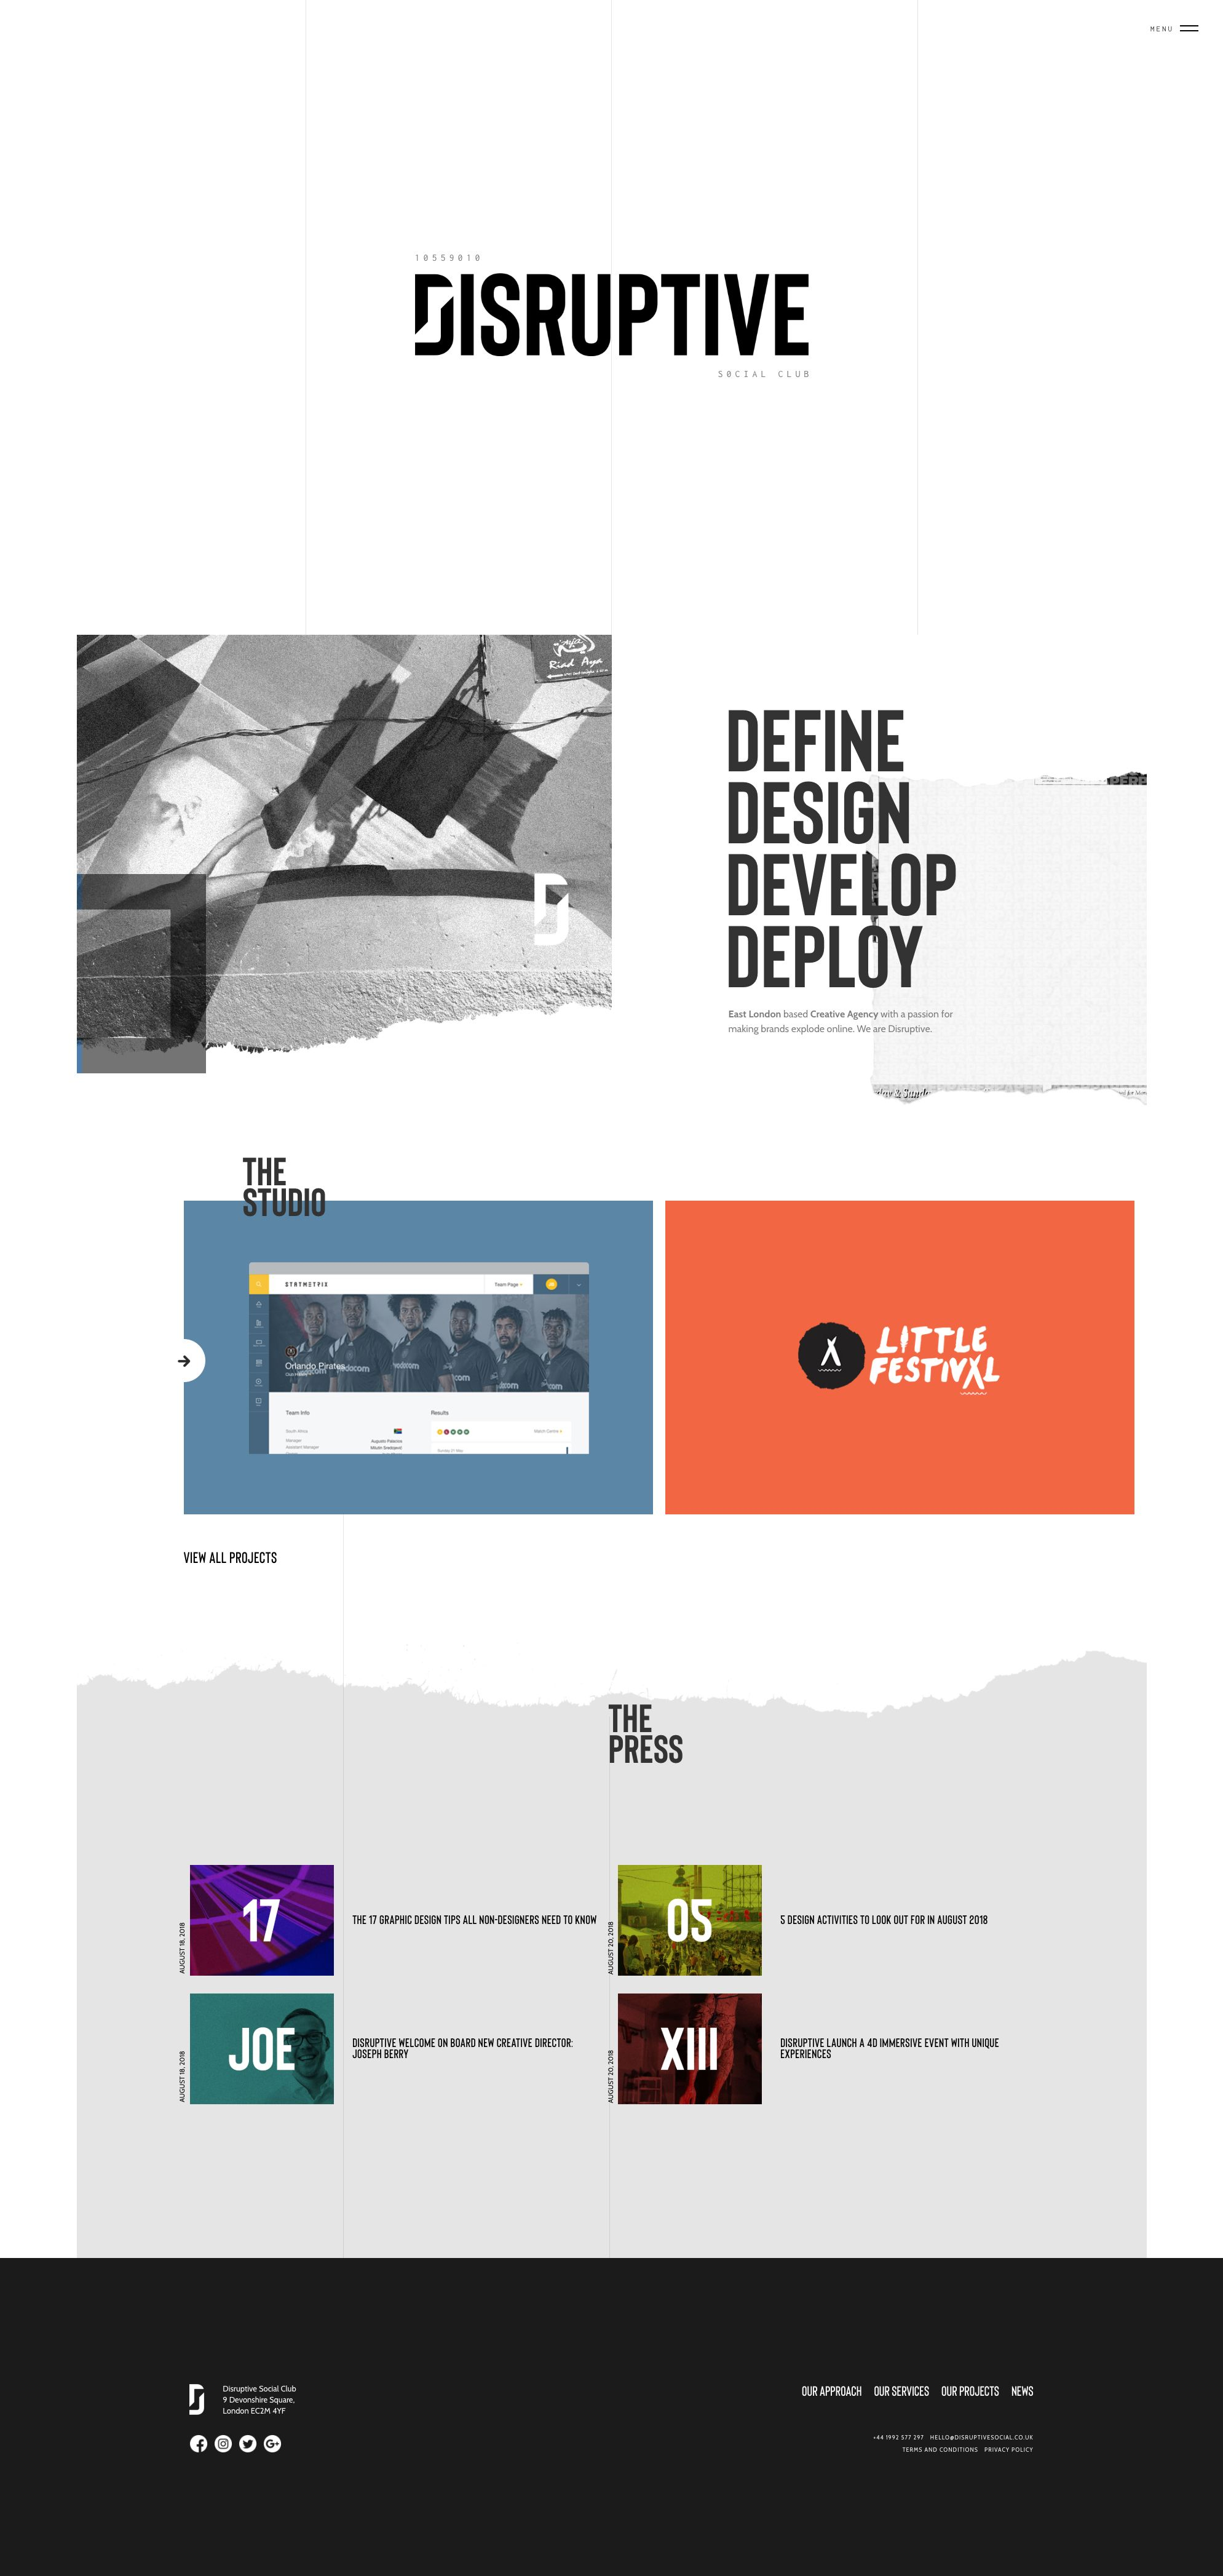 Creative Agency Web Design Agency London Creative Startup Website Webdev Business Freelancer Online Web Design Web Design Quotes Web Design Websites